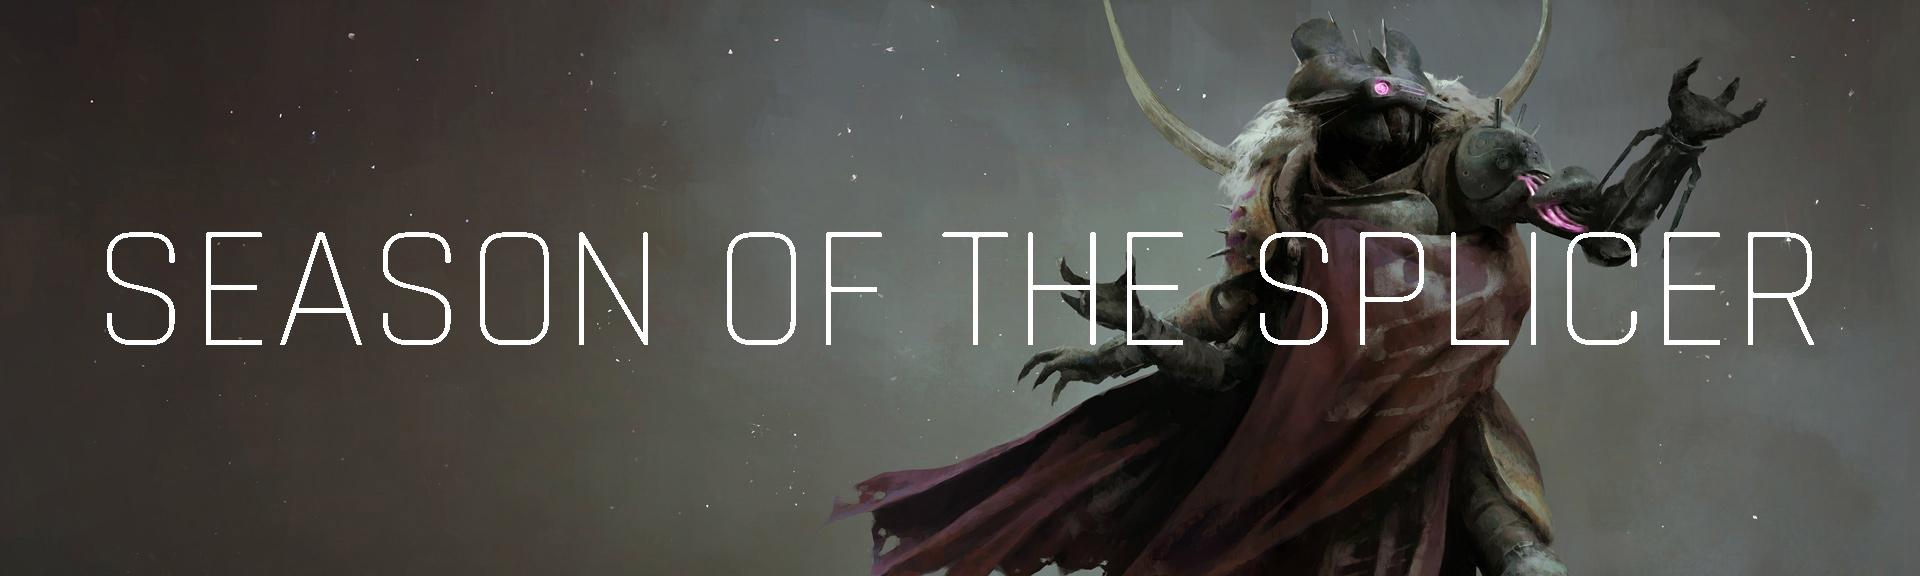 destiny 2 season of the splicer guides